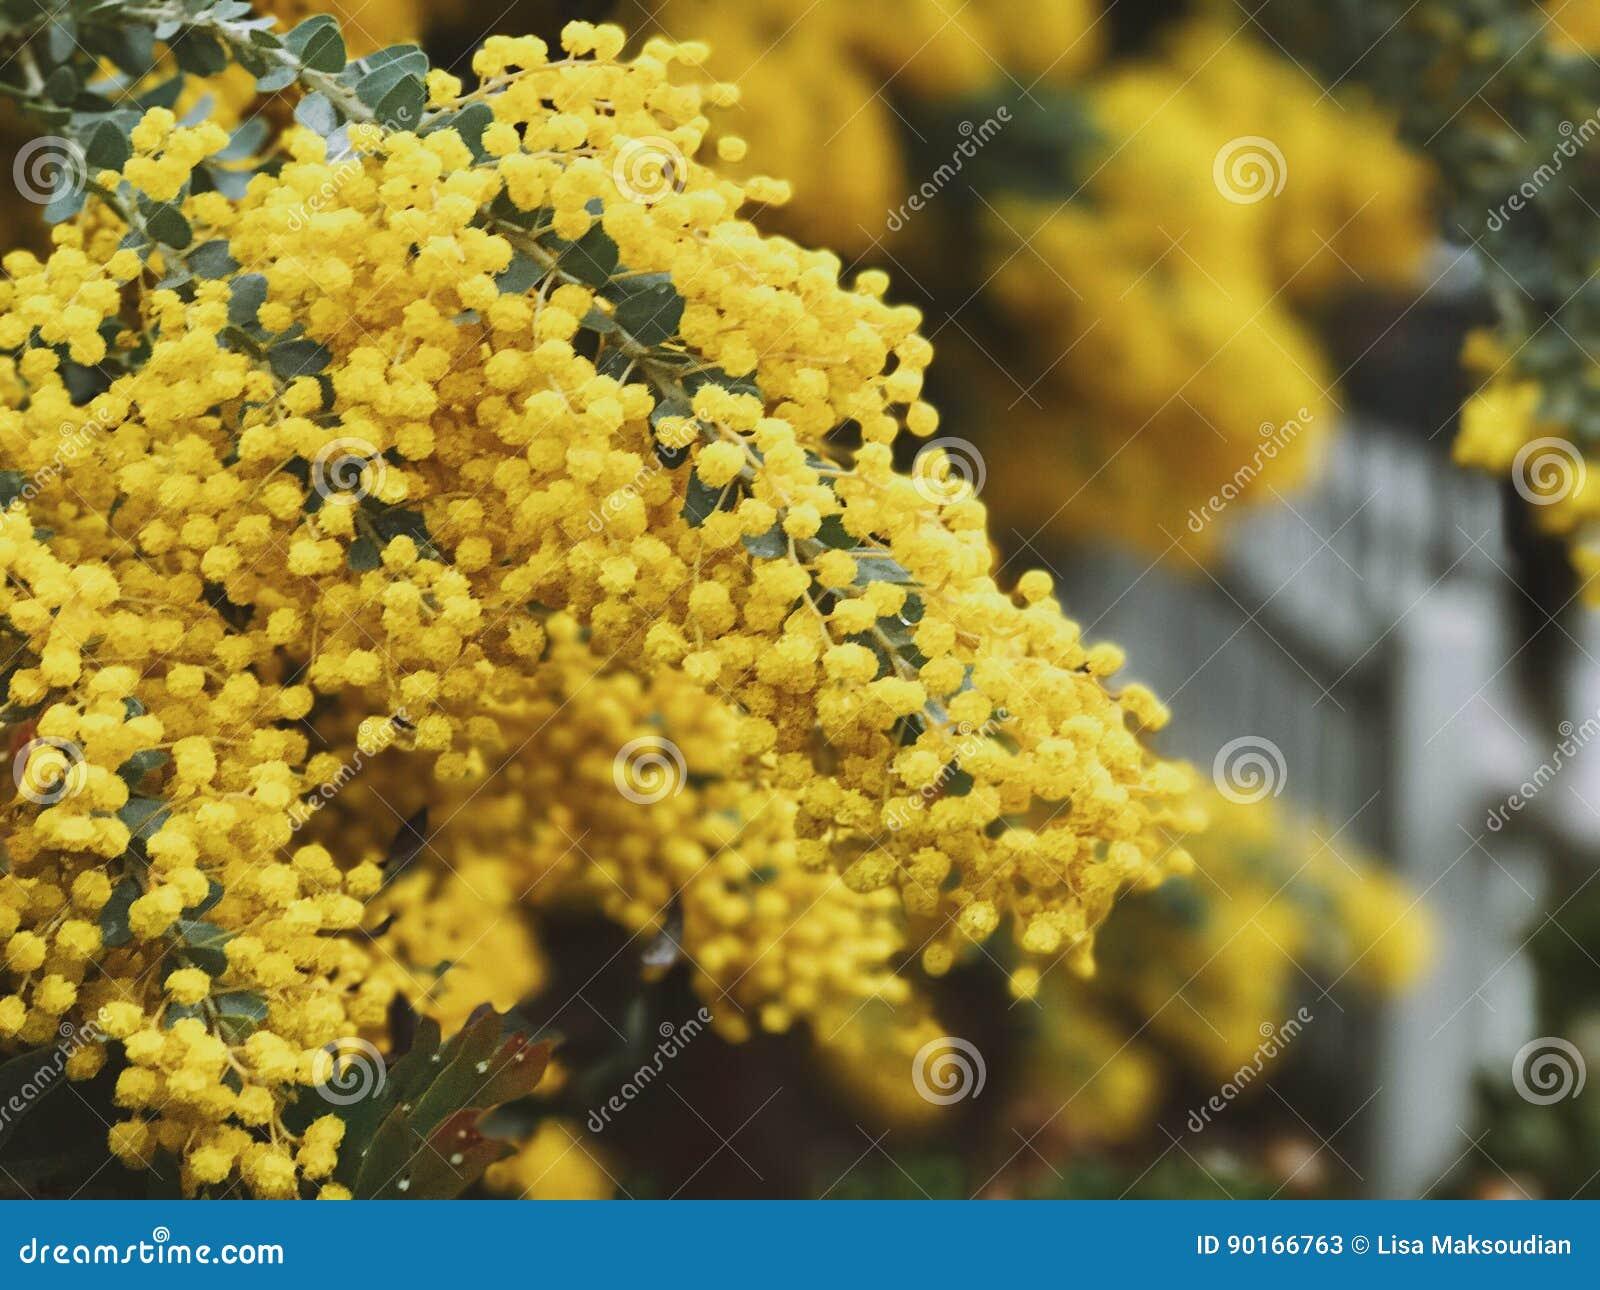 Yellow flower balls stock image image of pollen yellow 90166763 yellow flower balls mightylinksfo